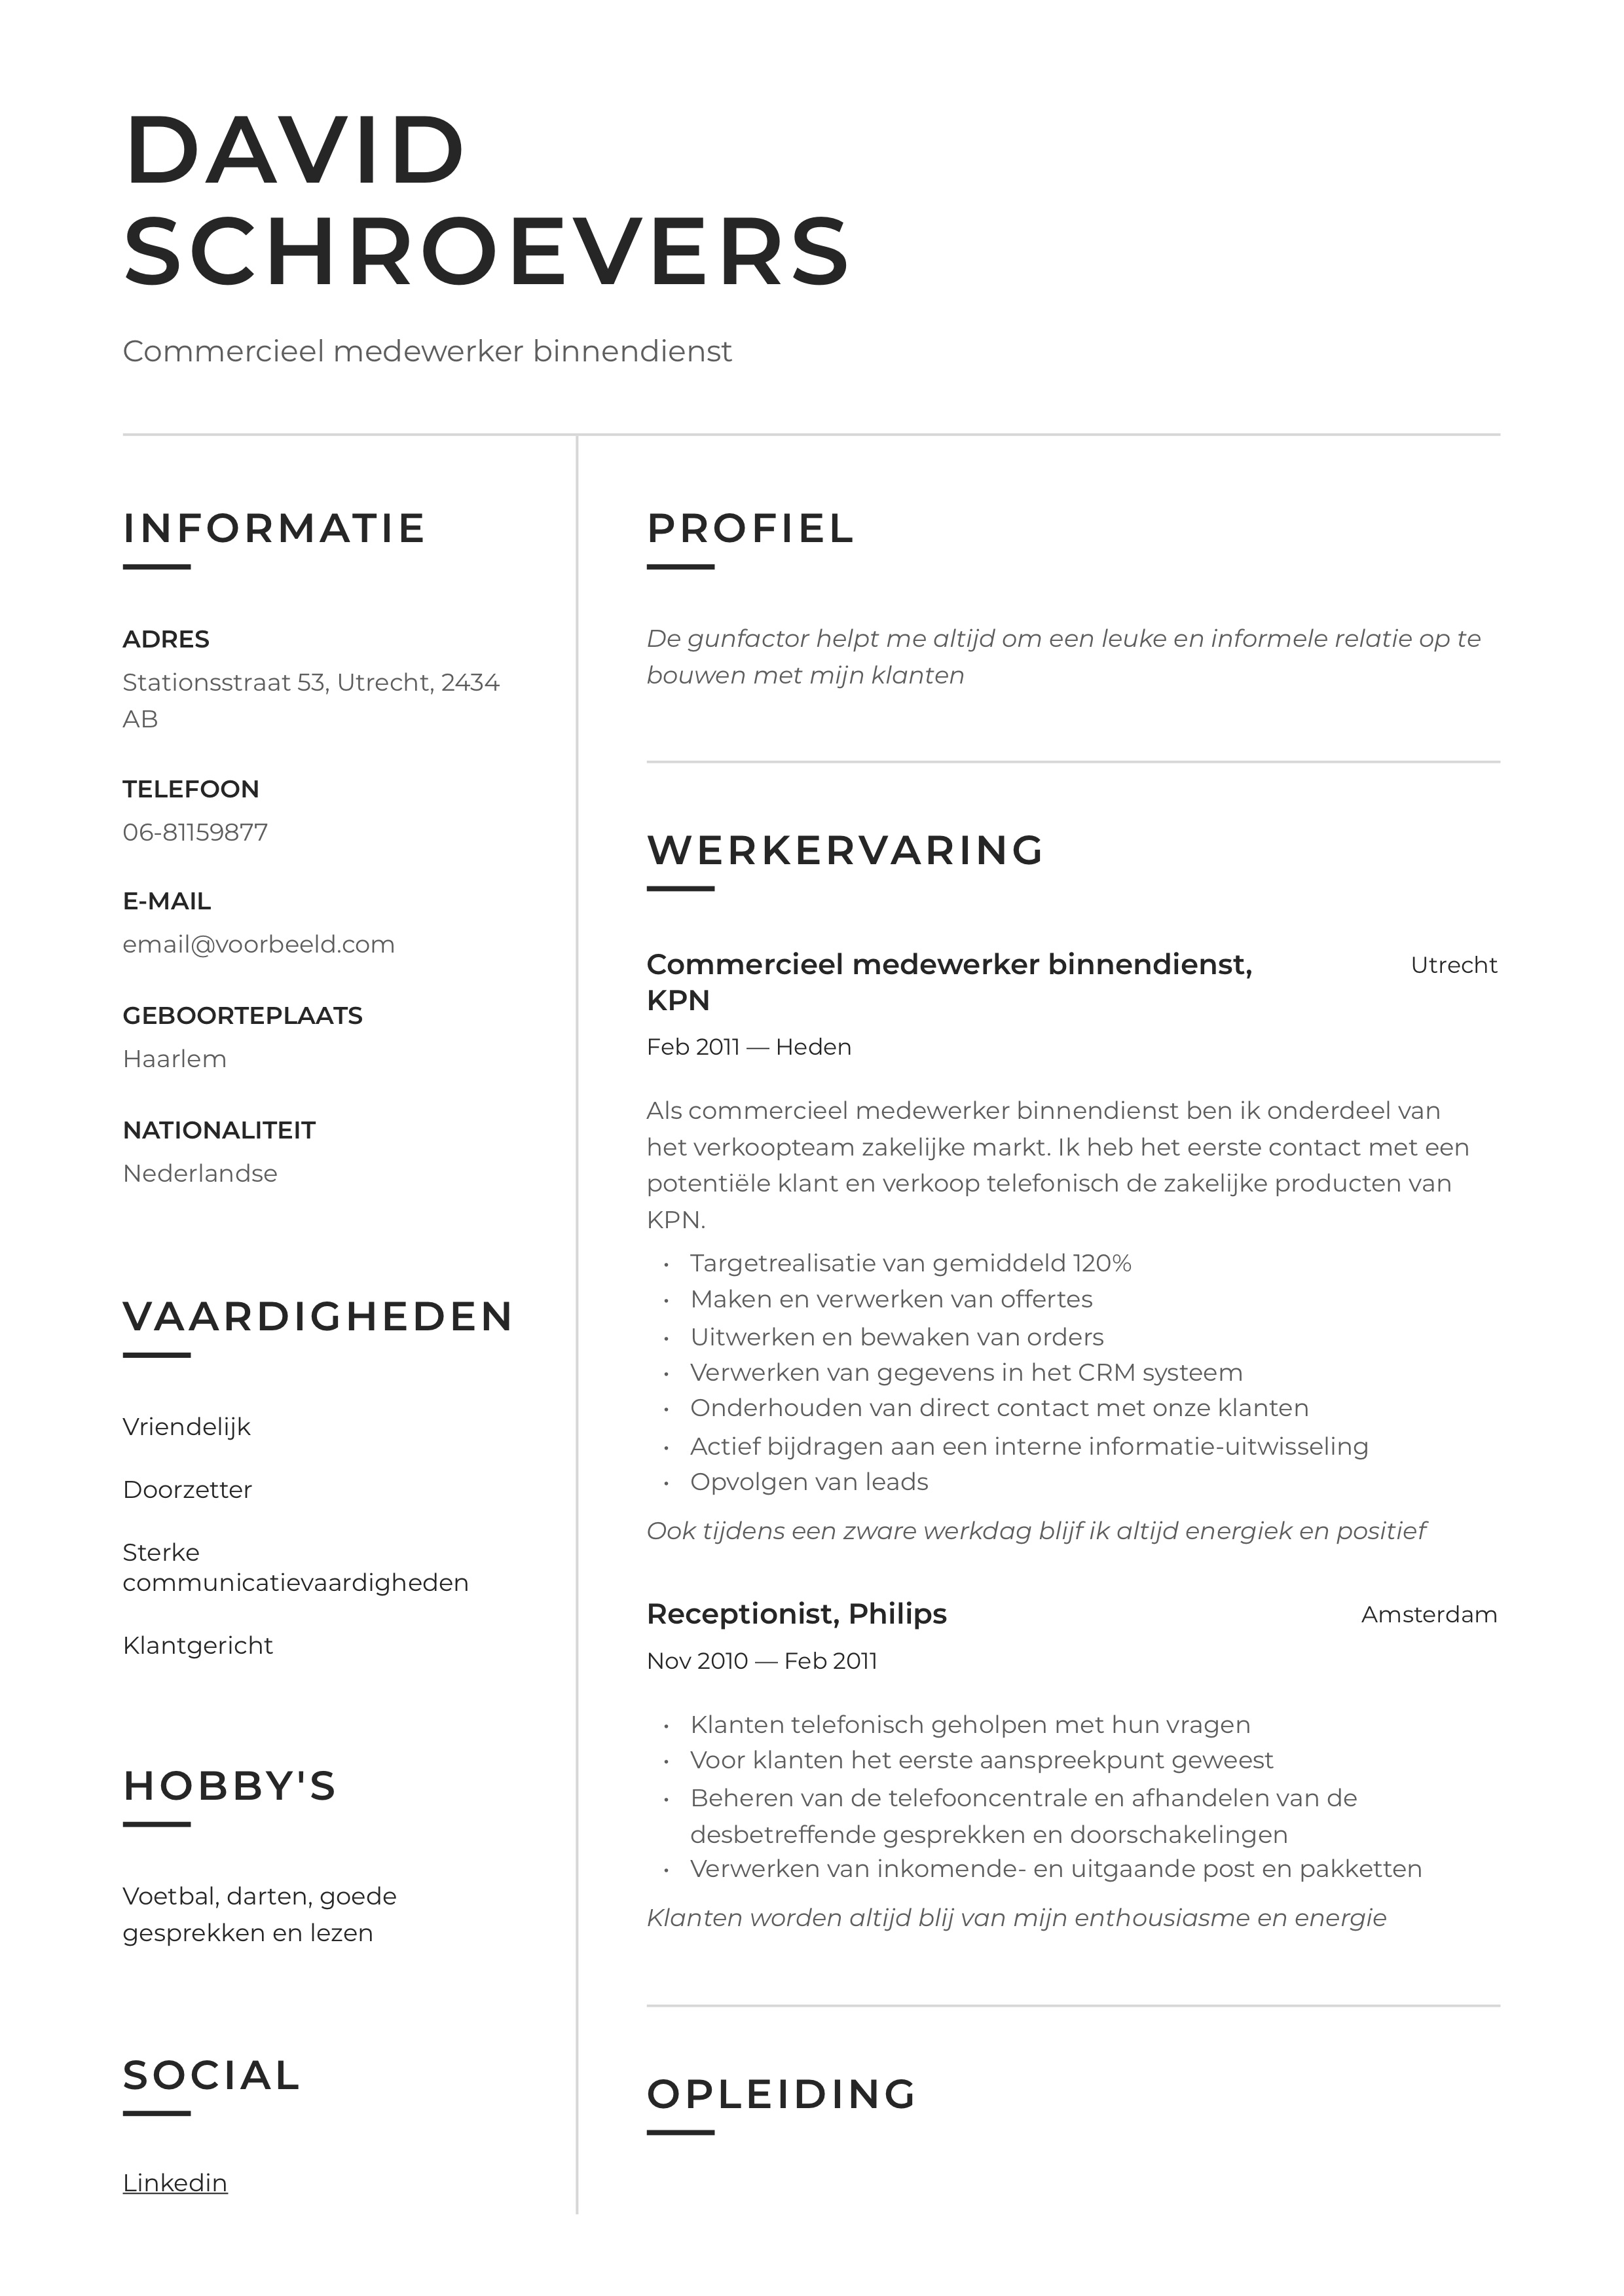 CV Voorbeeld Commercieel medewerker binnendienst